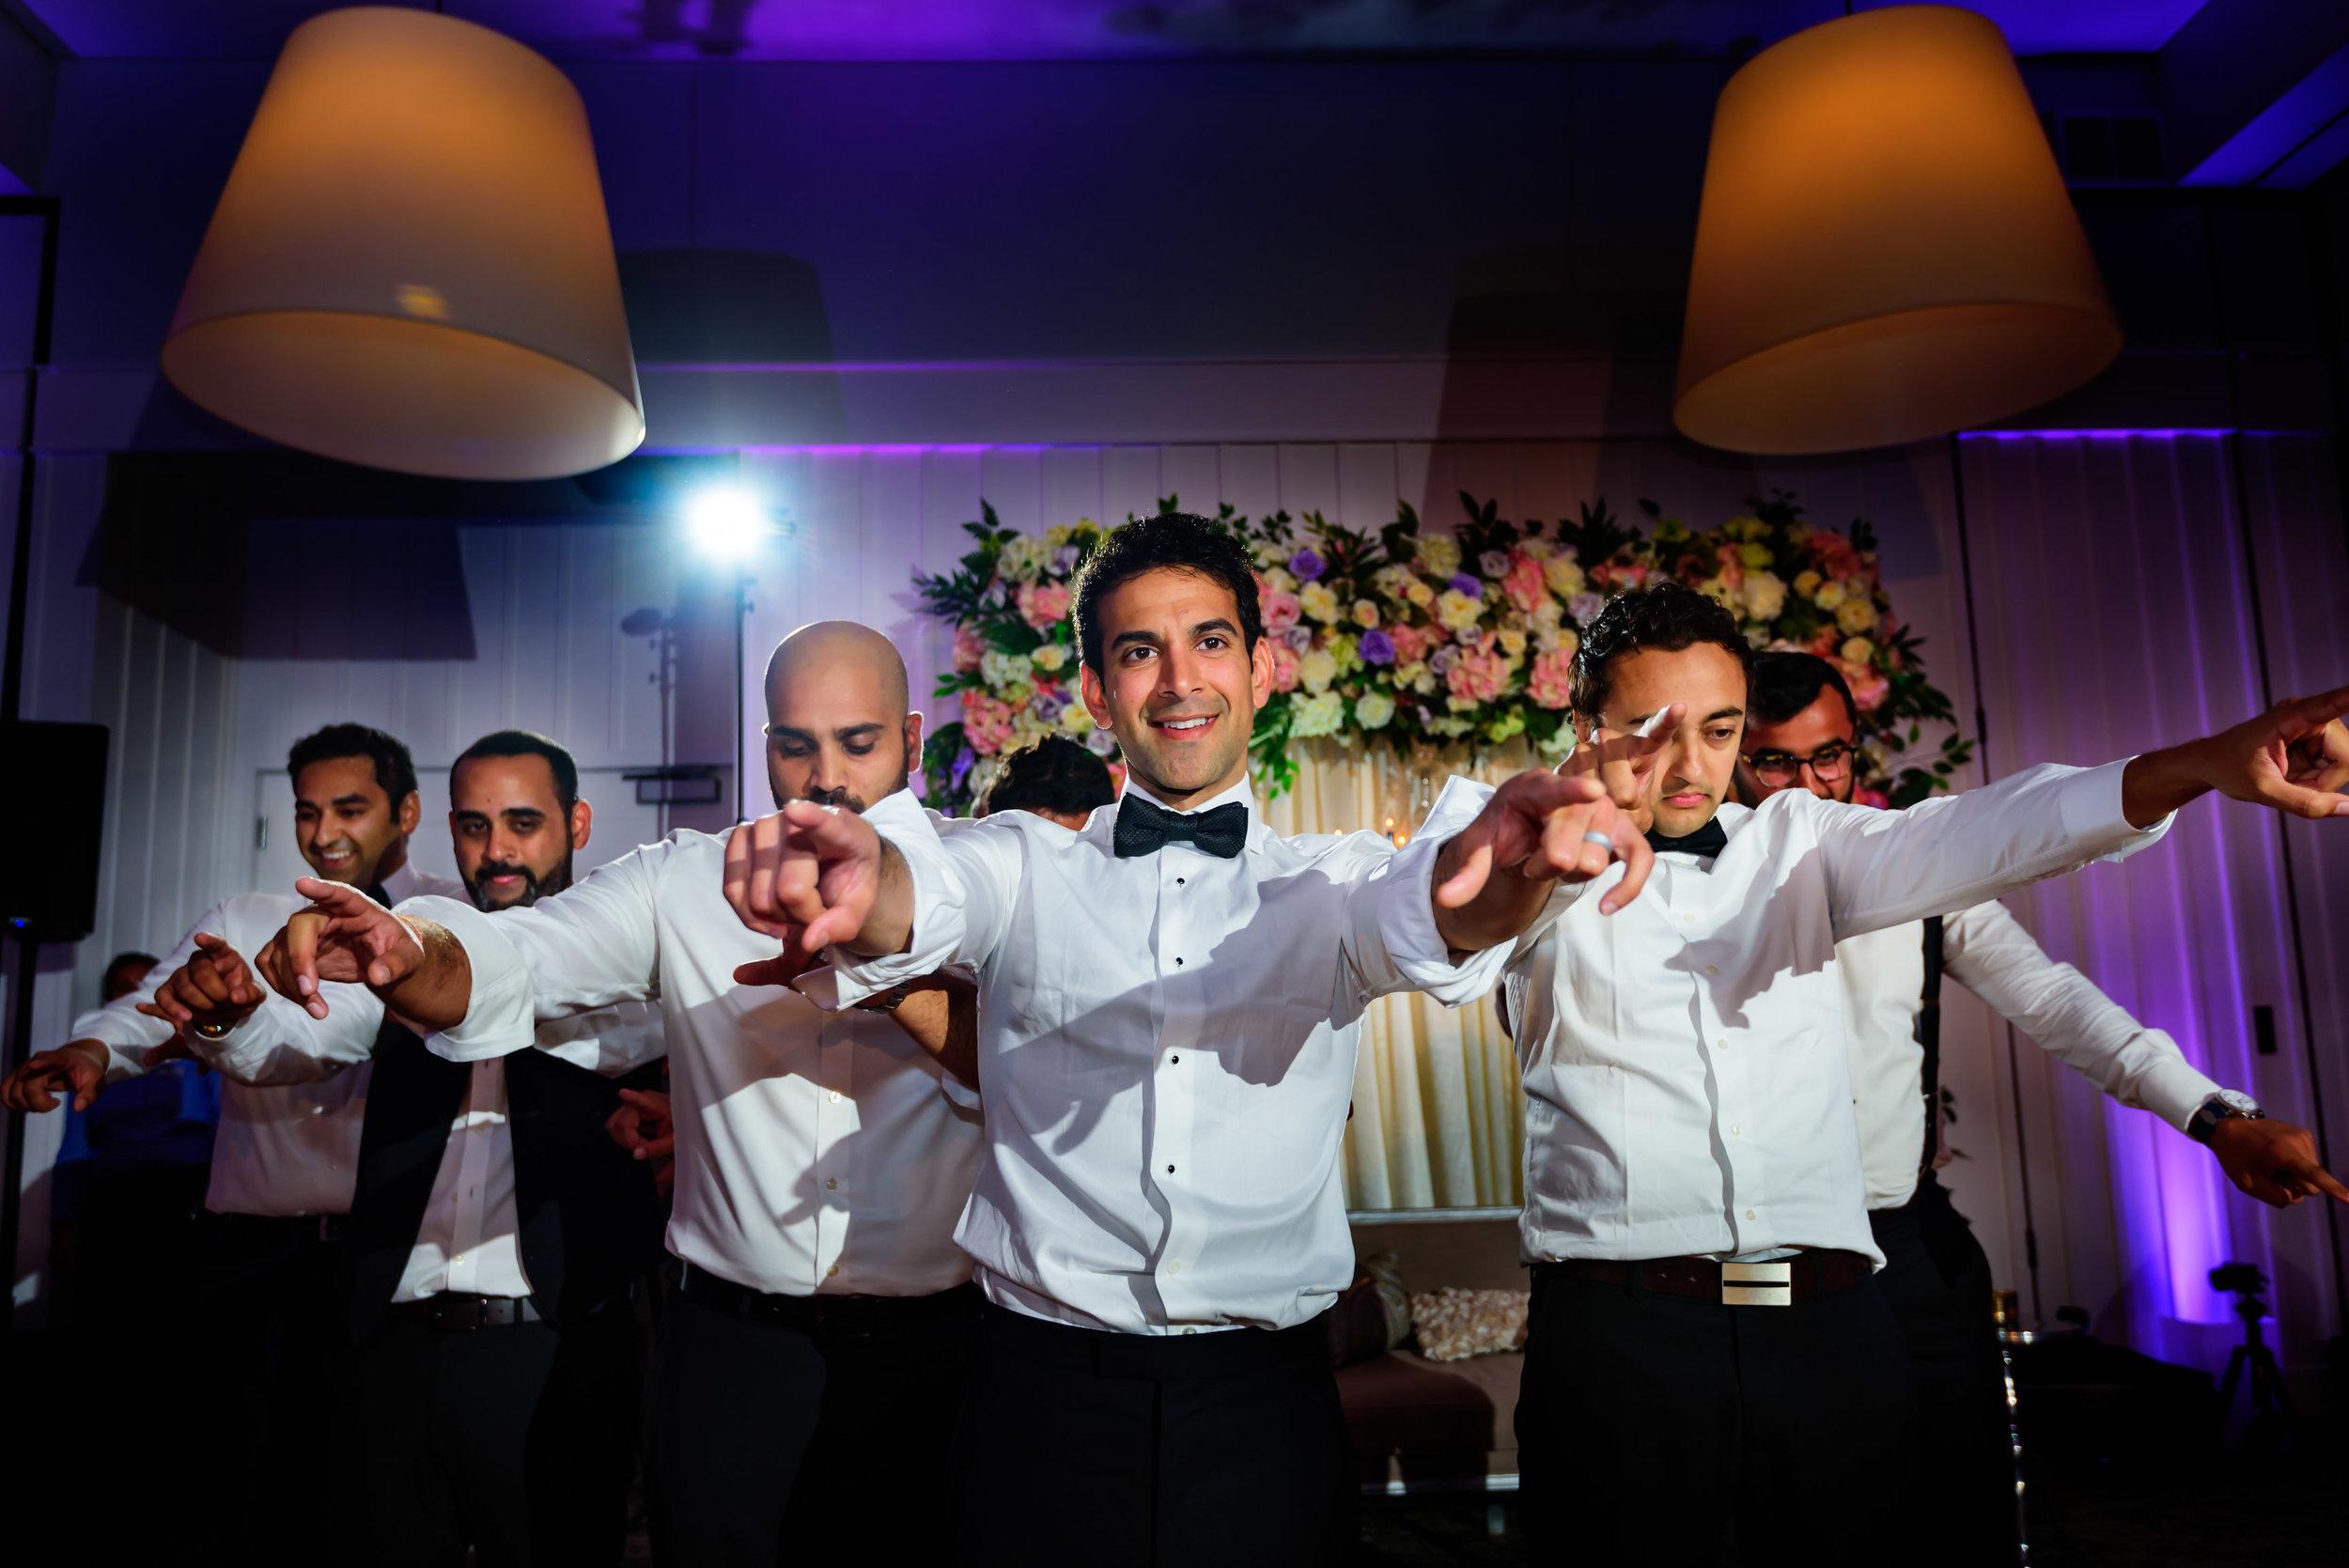 Napa Indian wedding photography